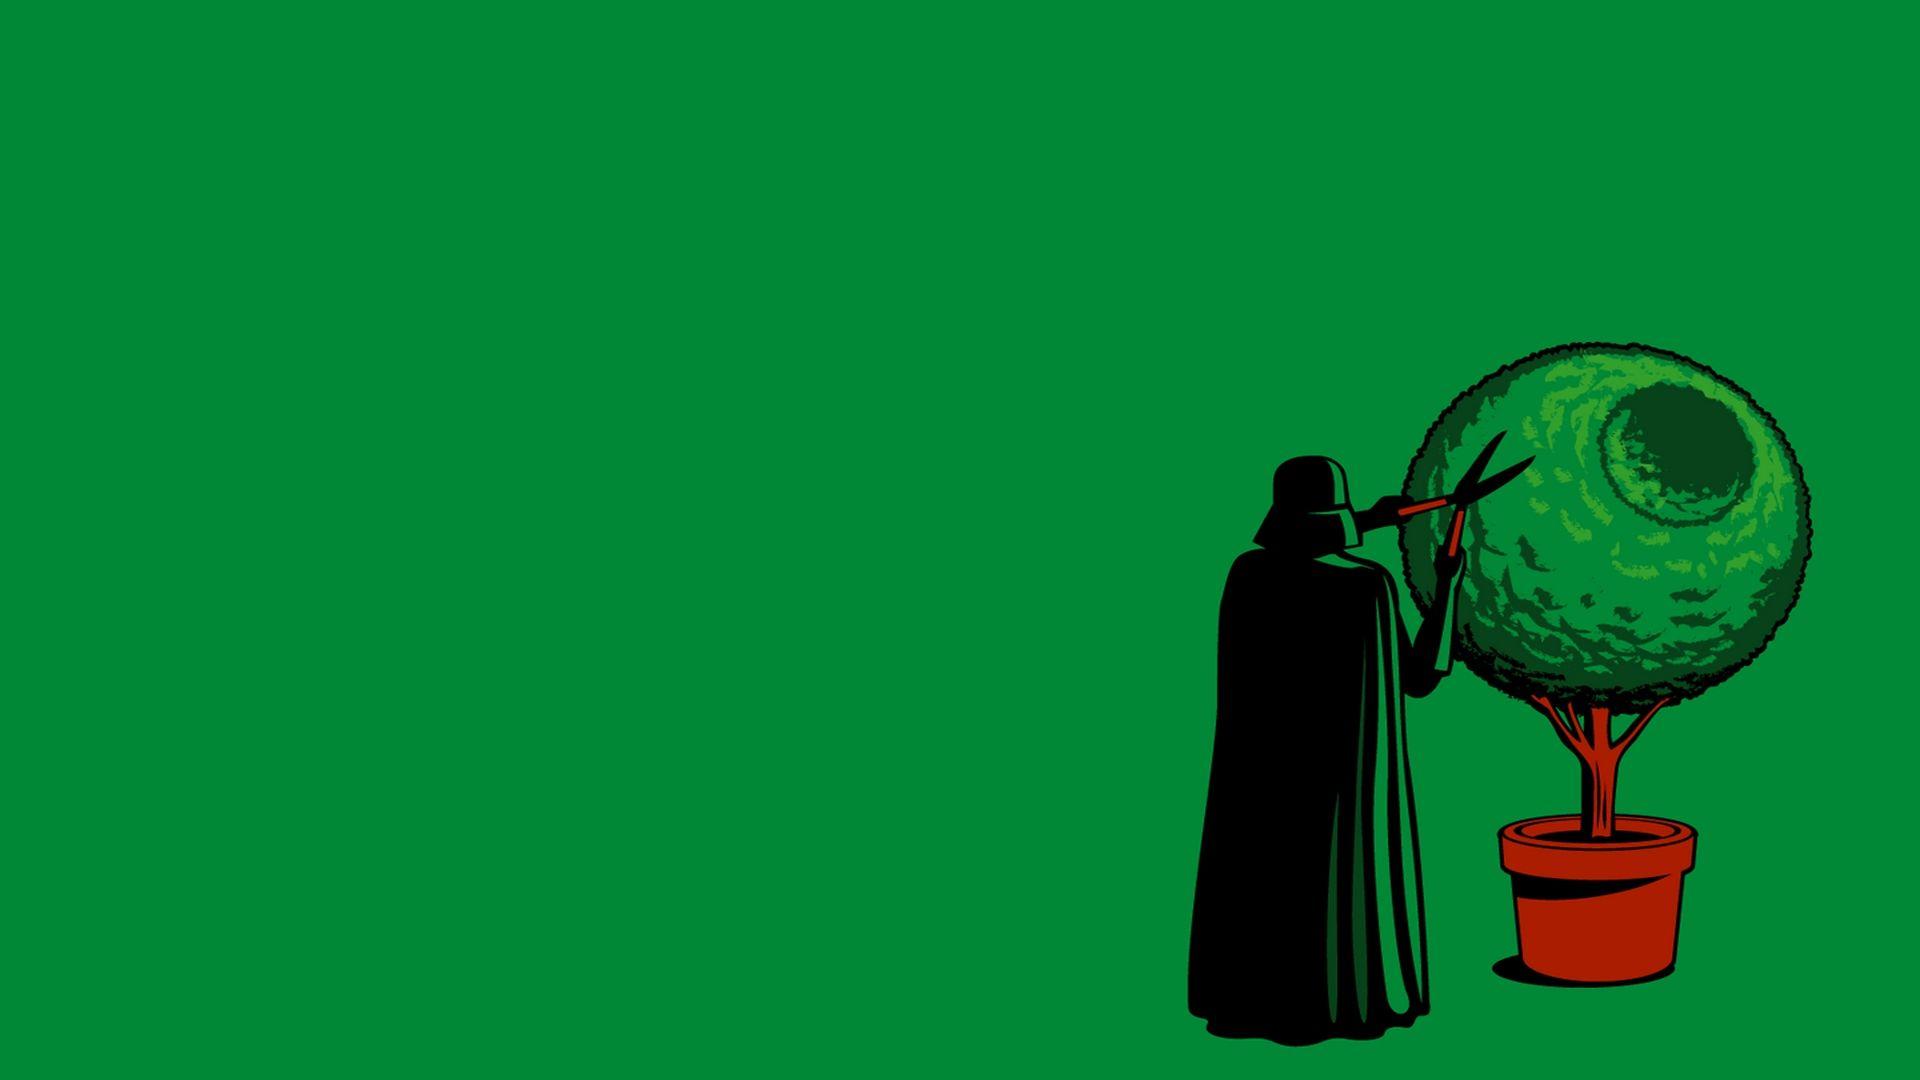 Darth Vader Taking It Easy 1920x1080 Star Wars Wallpaper Darth Vader Wallpaper Star Wars Pictures